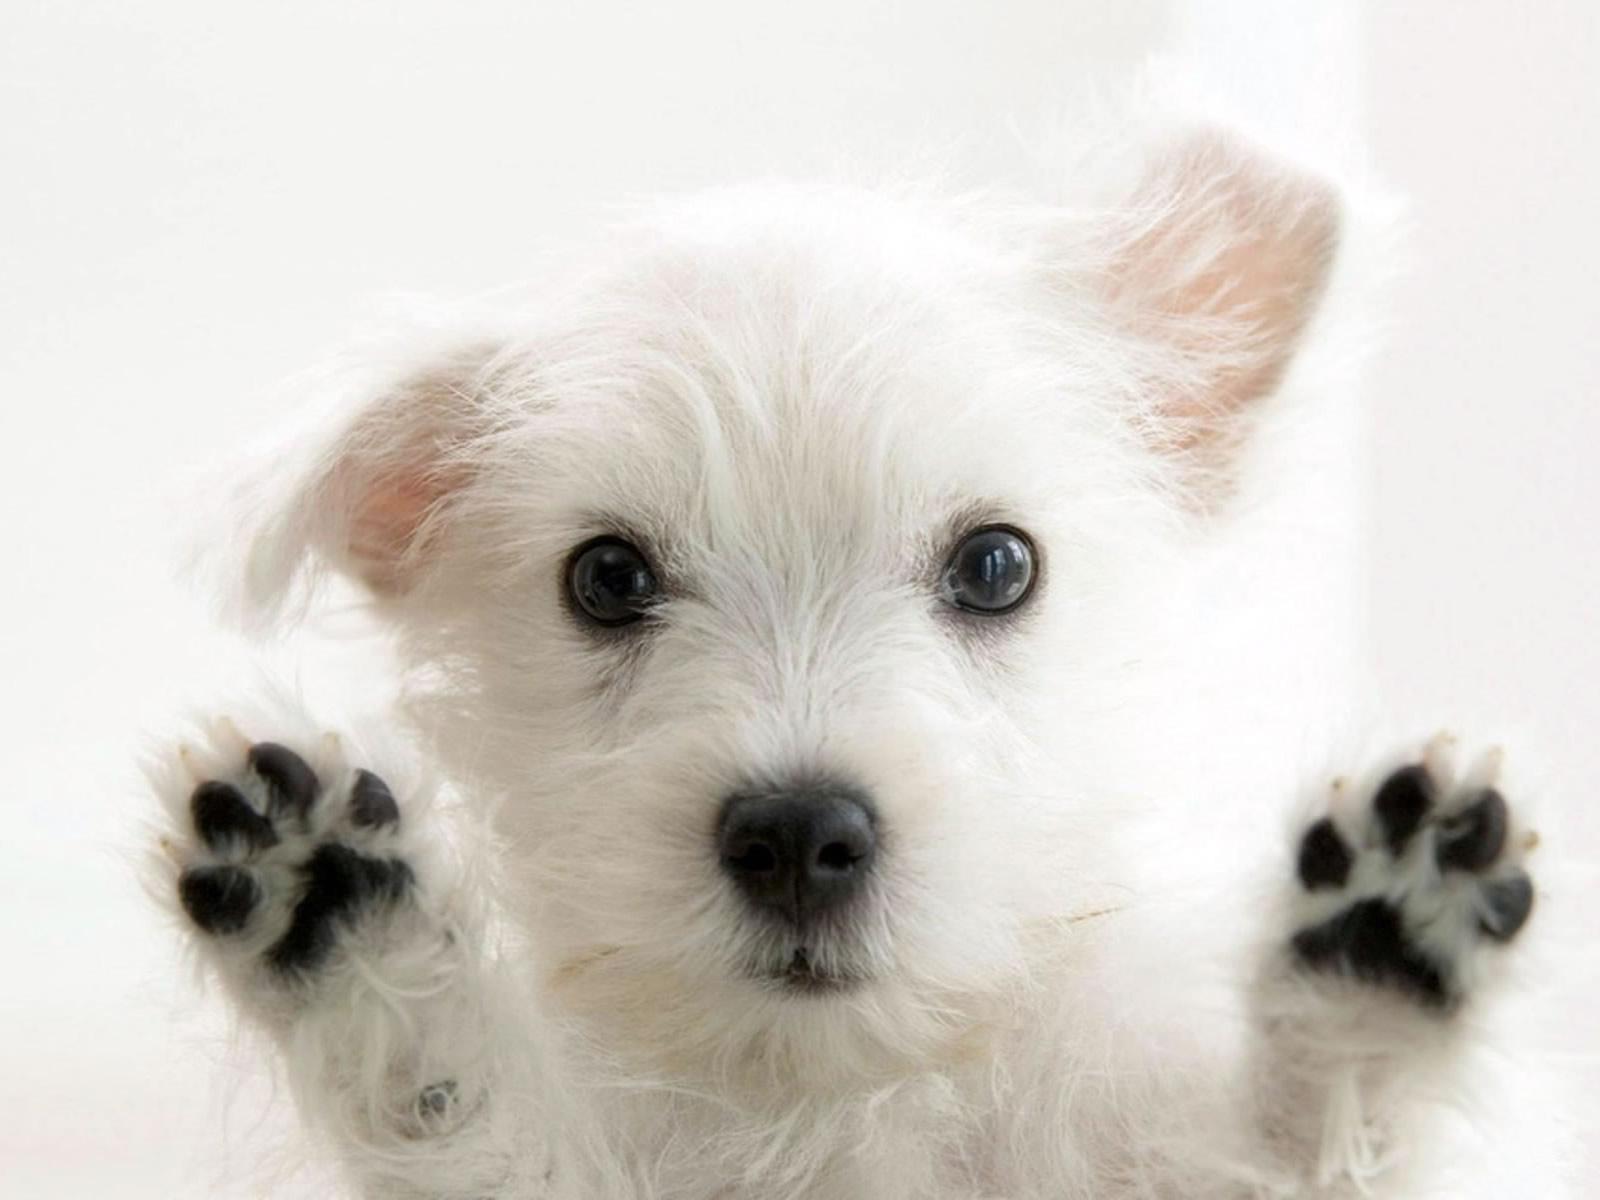 jpg   Dogs Wallpaper 33040614 1600x1200